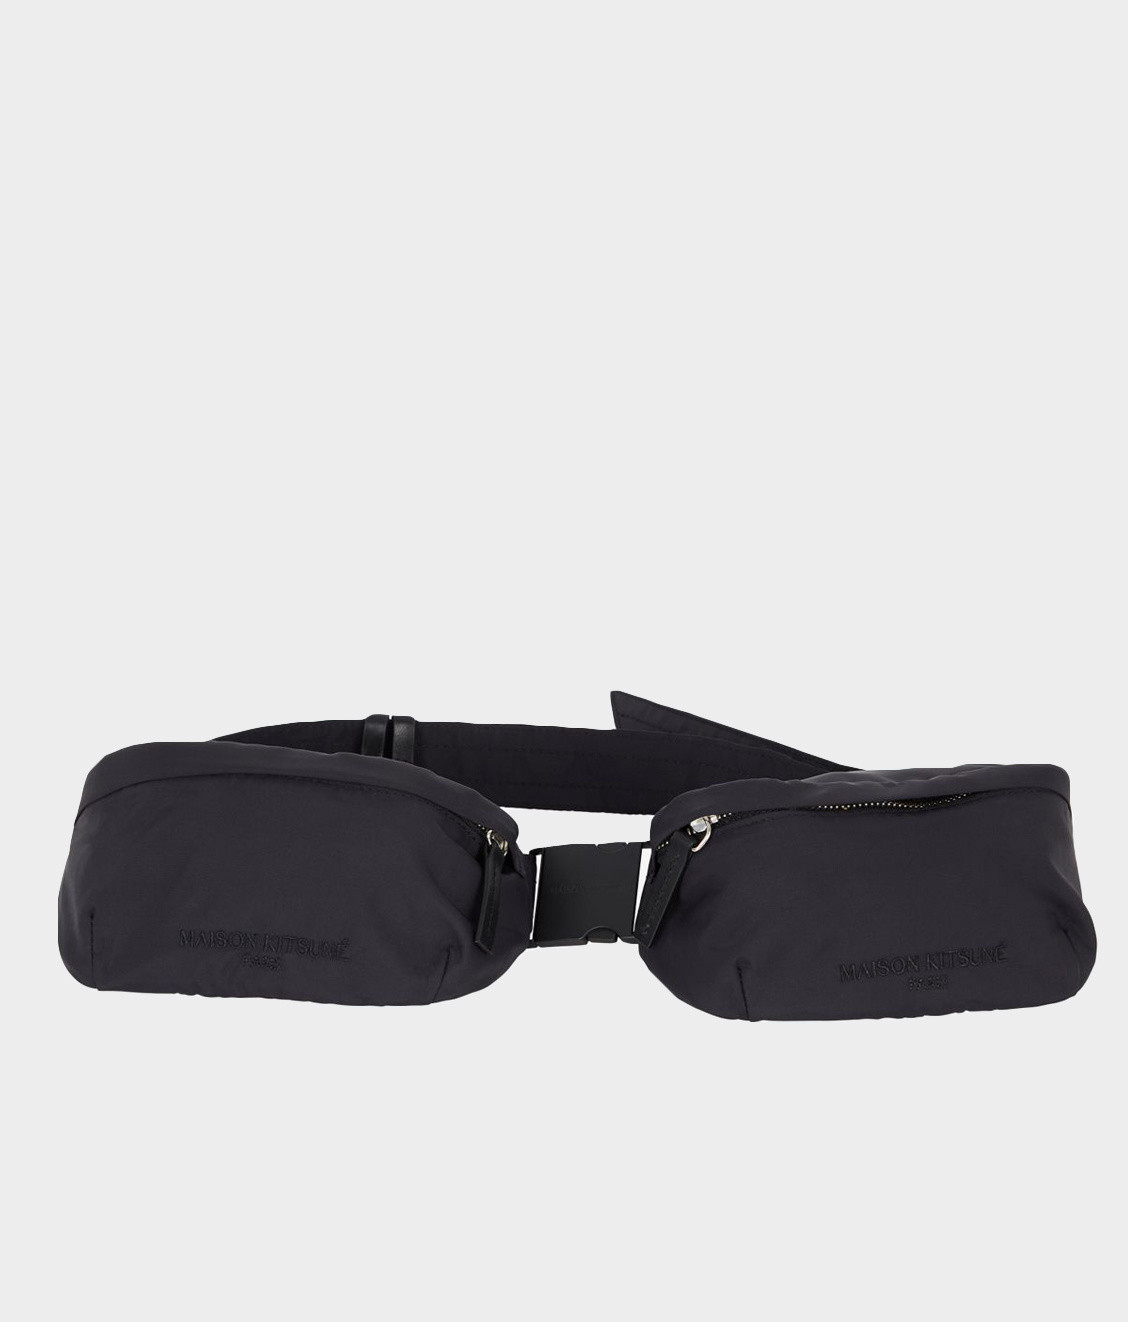 Maison Kitsune Maison Kitsune Double Beltbag Black